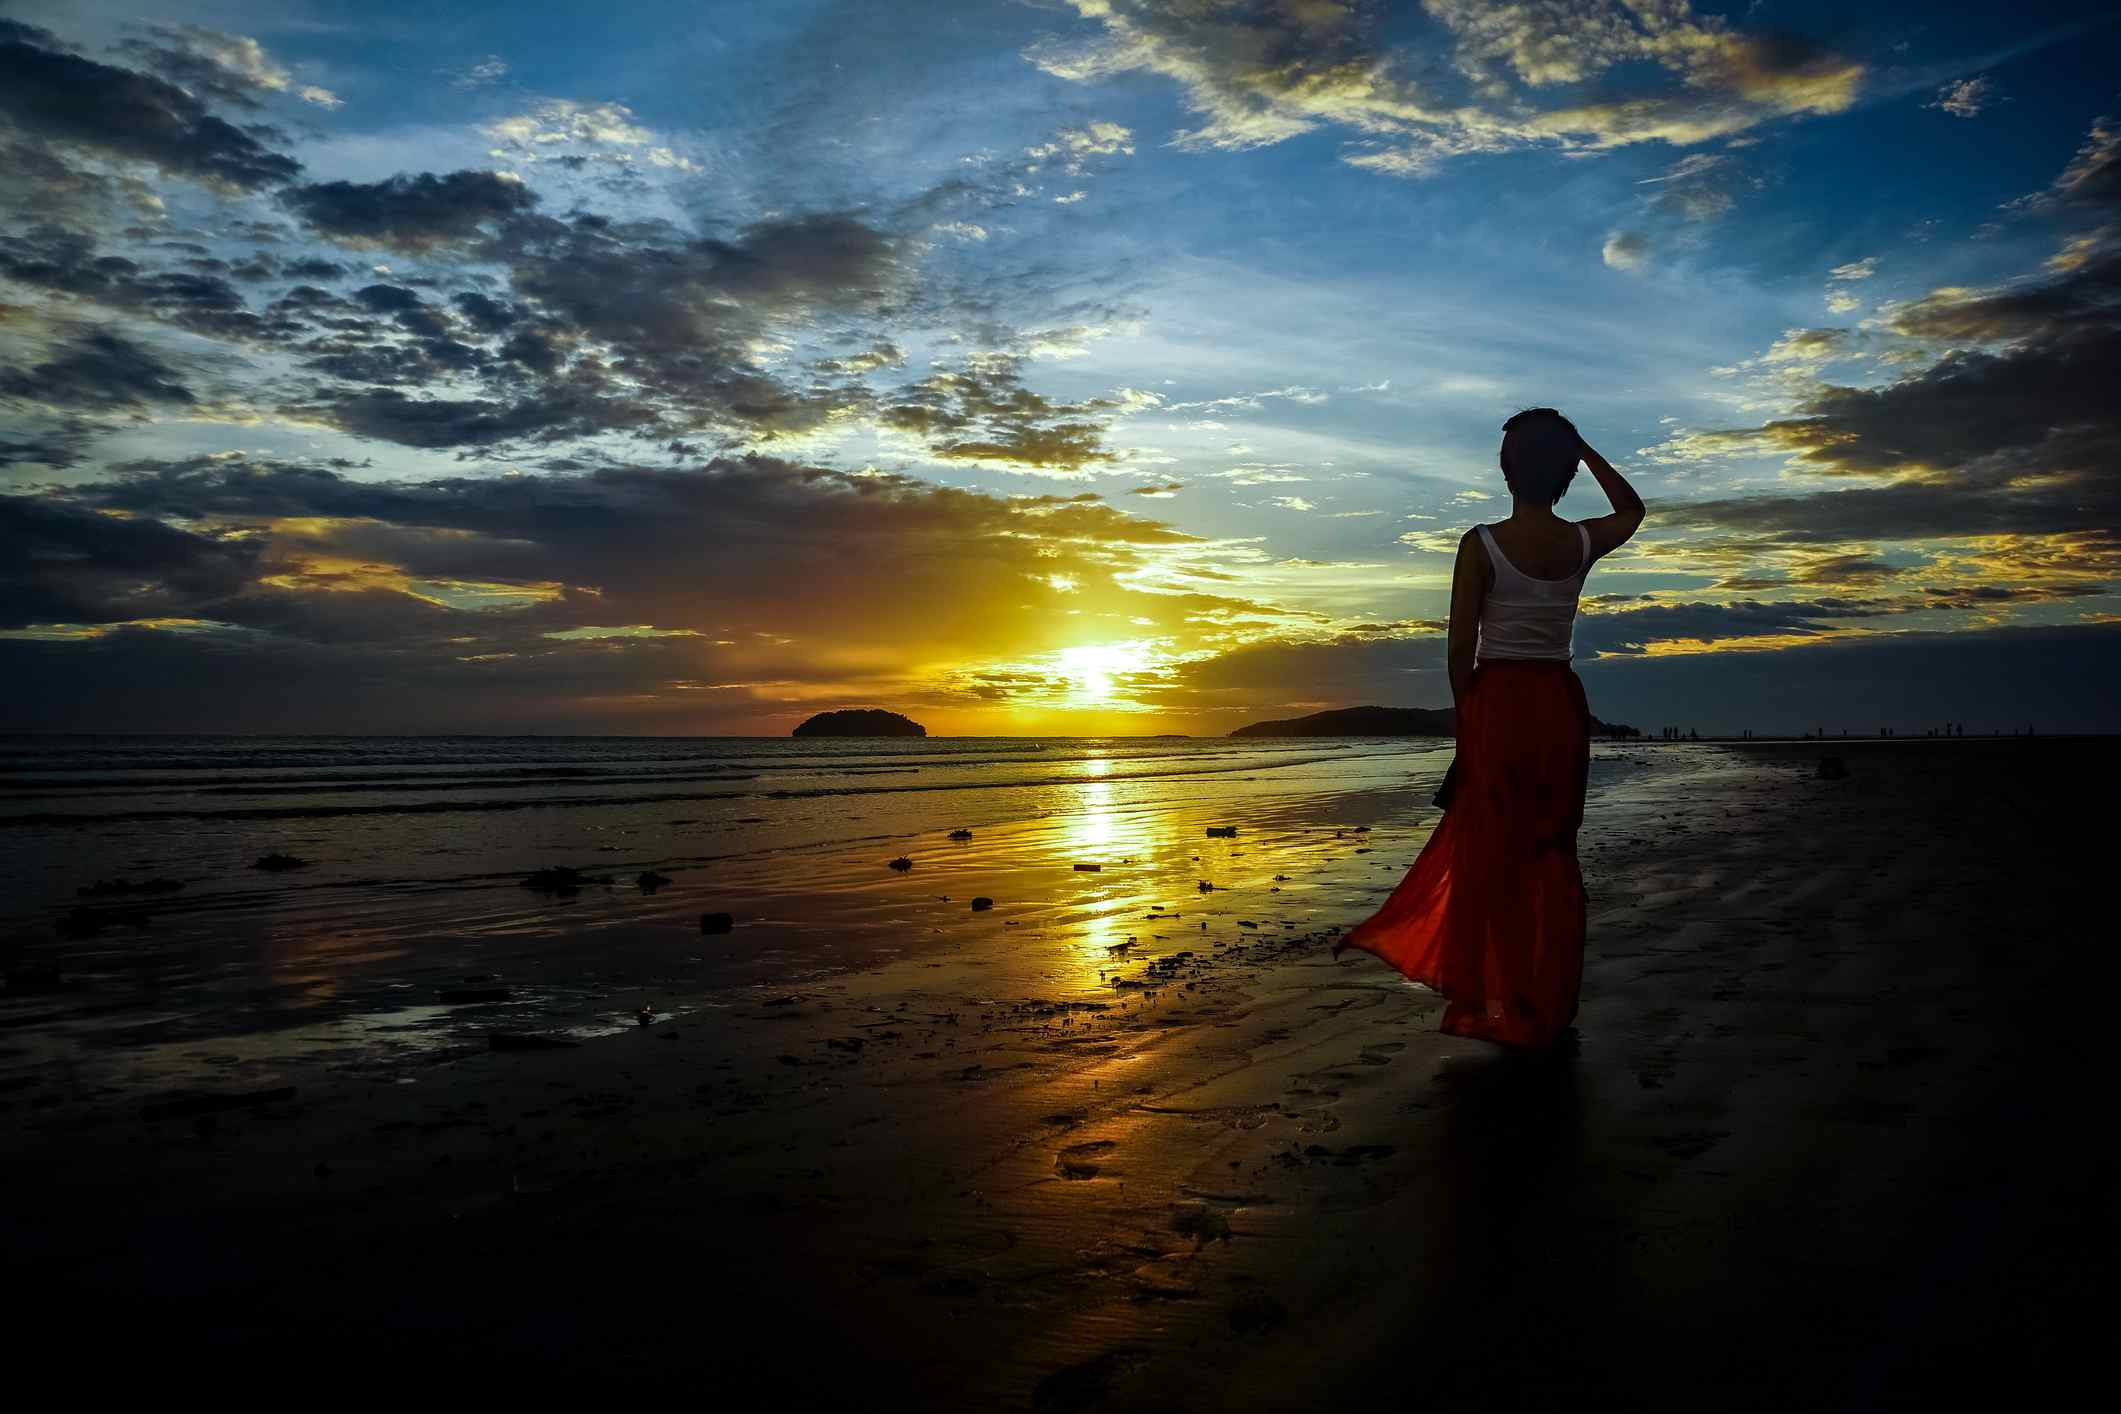 Tanjung Aru at sunset